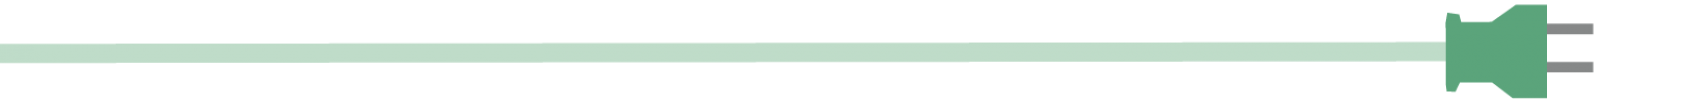 Kontakt - Ladefabrikken